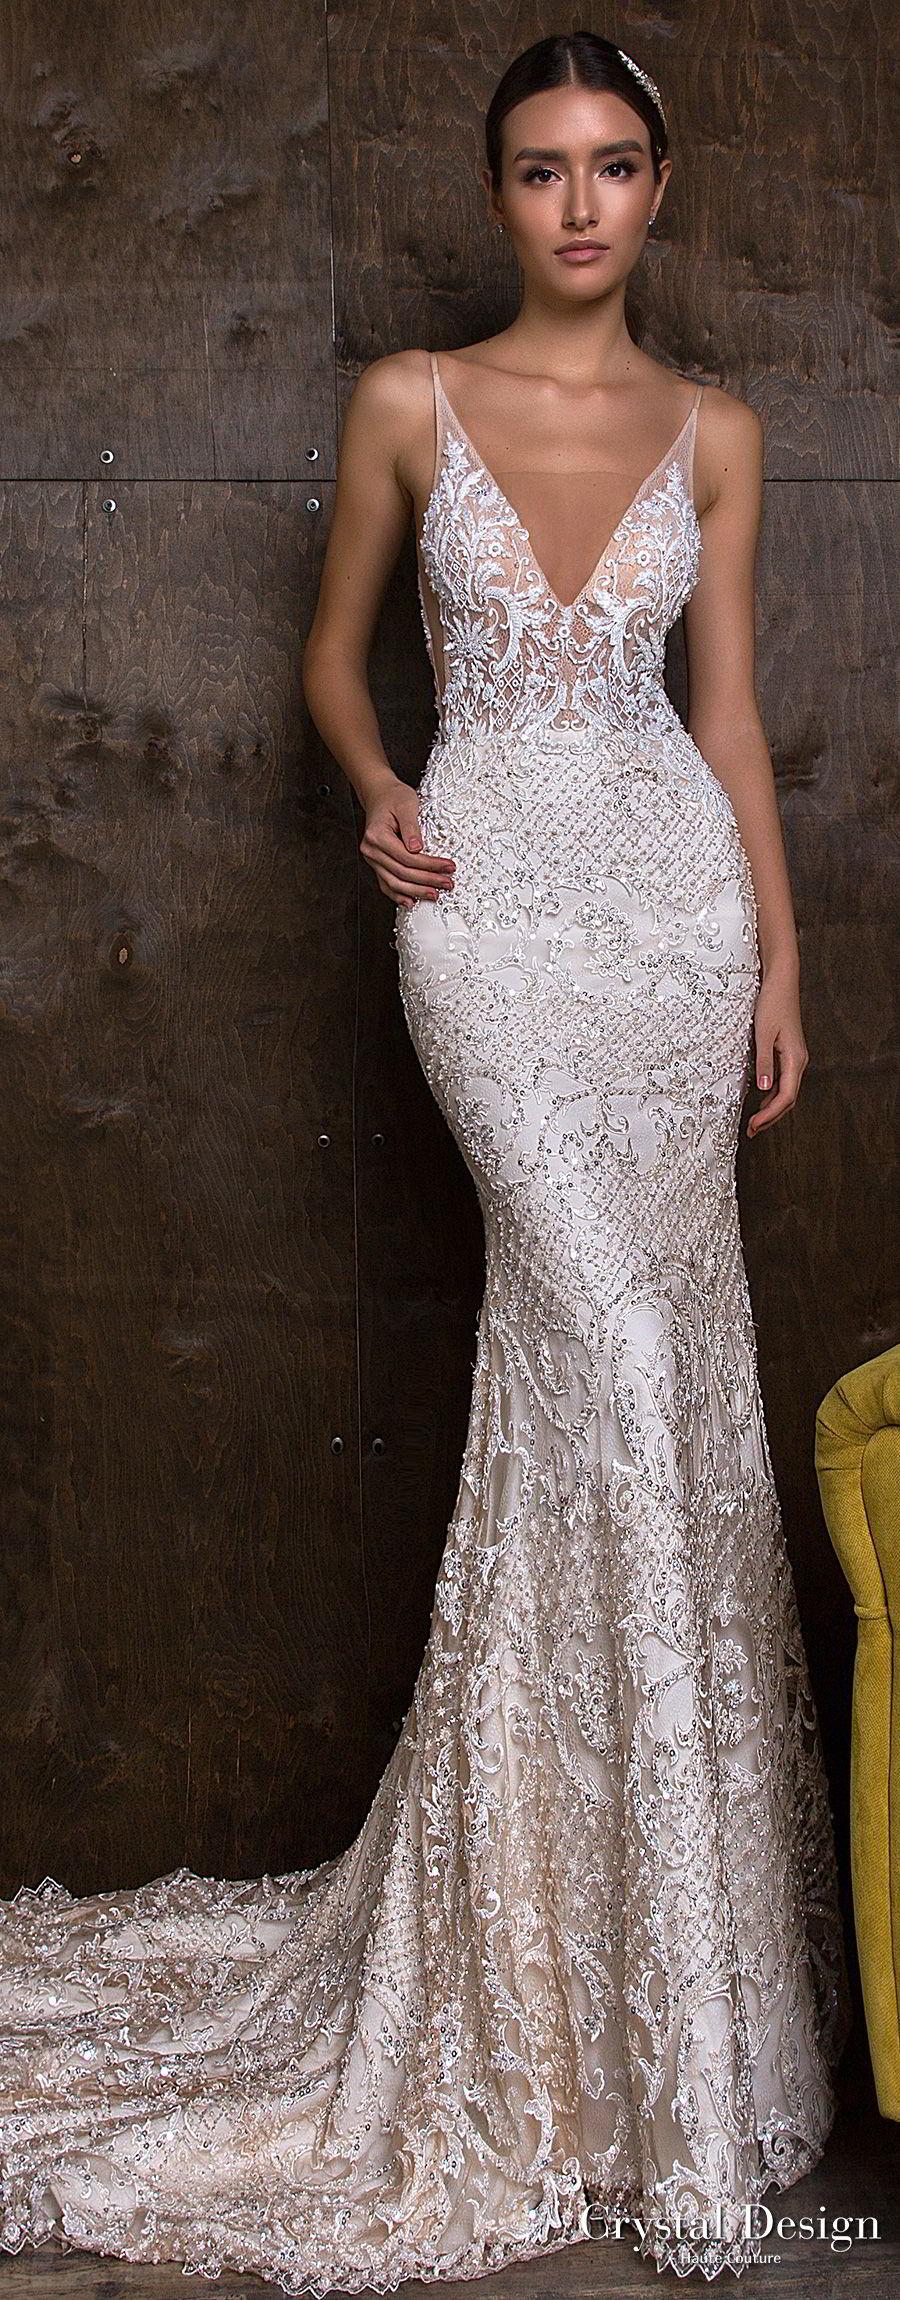 crystal design 2018 sleeveless deep v neck full embellishment elegant sheath fit and flare wedding dress open v back medium train (esben) mv